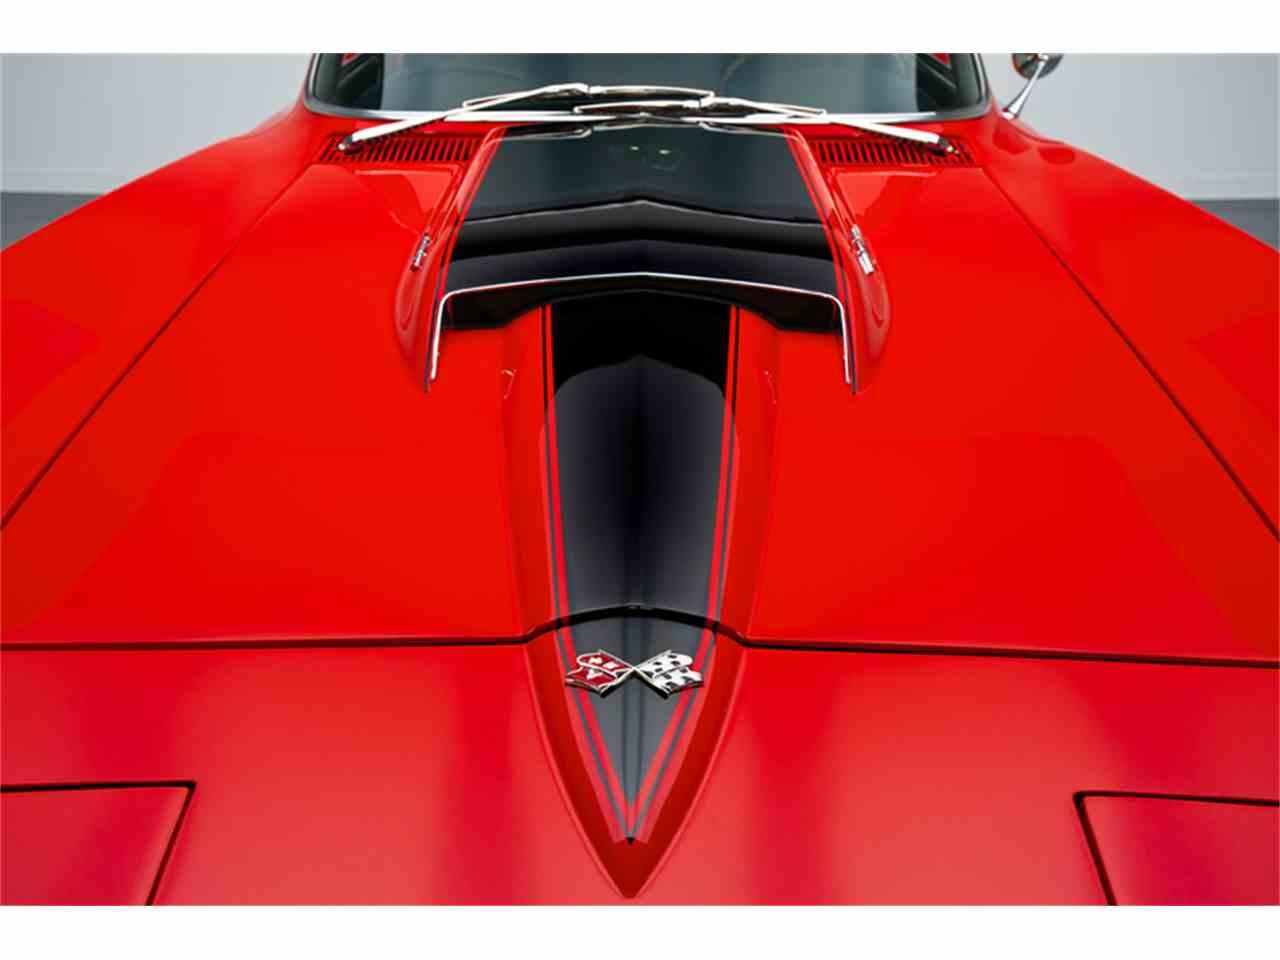 Large Picture of '64 Corvette Stingray located in Charlotte North Carolina - $119,900.00 - LT7F